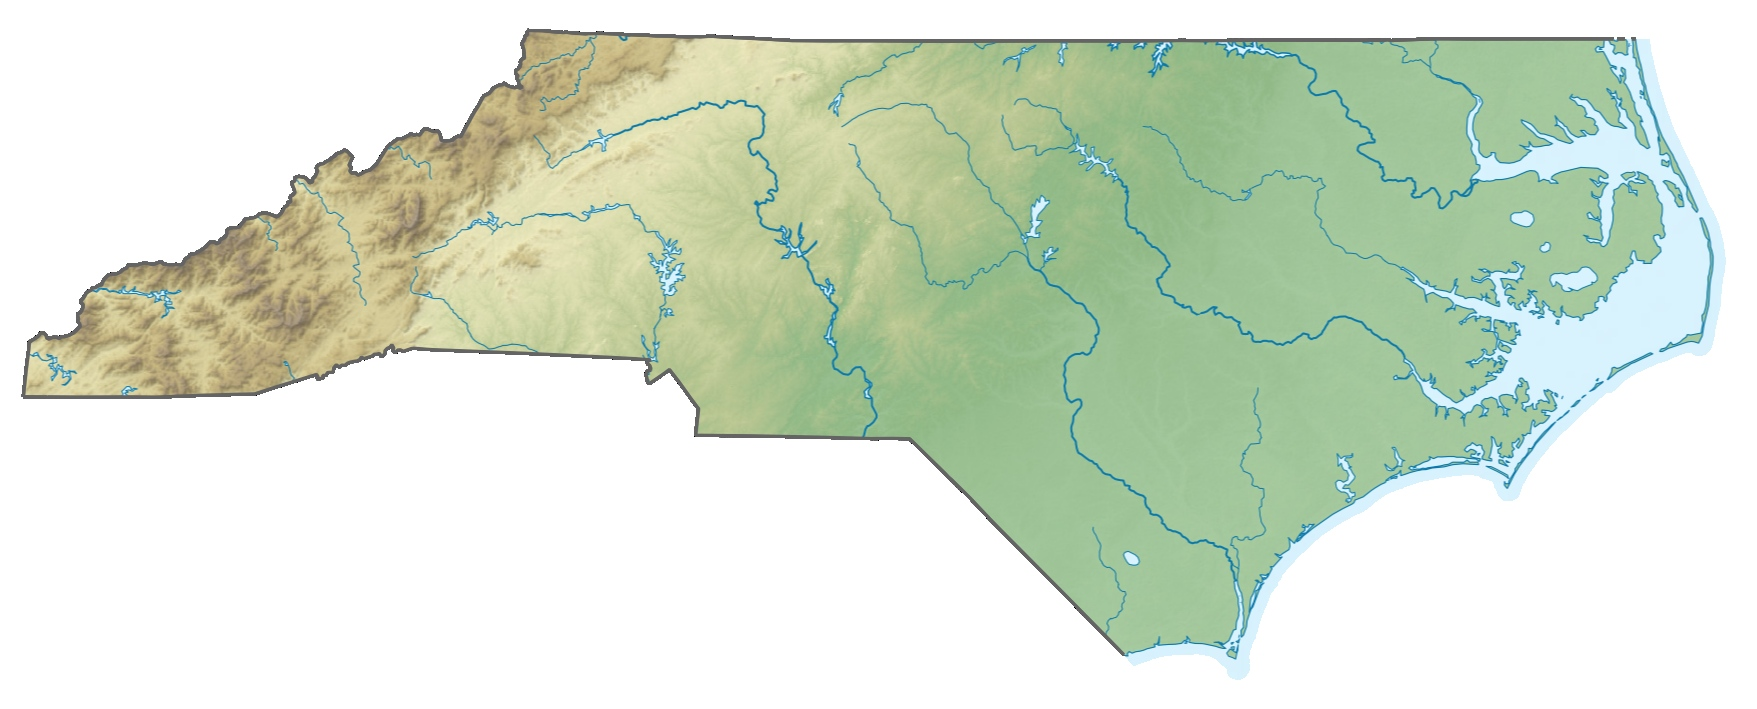 FileUSA North Carolina relief map cutjpg FileUSA